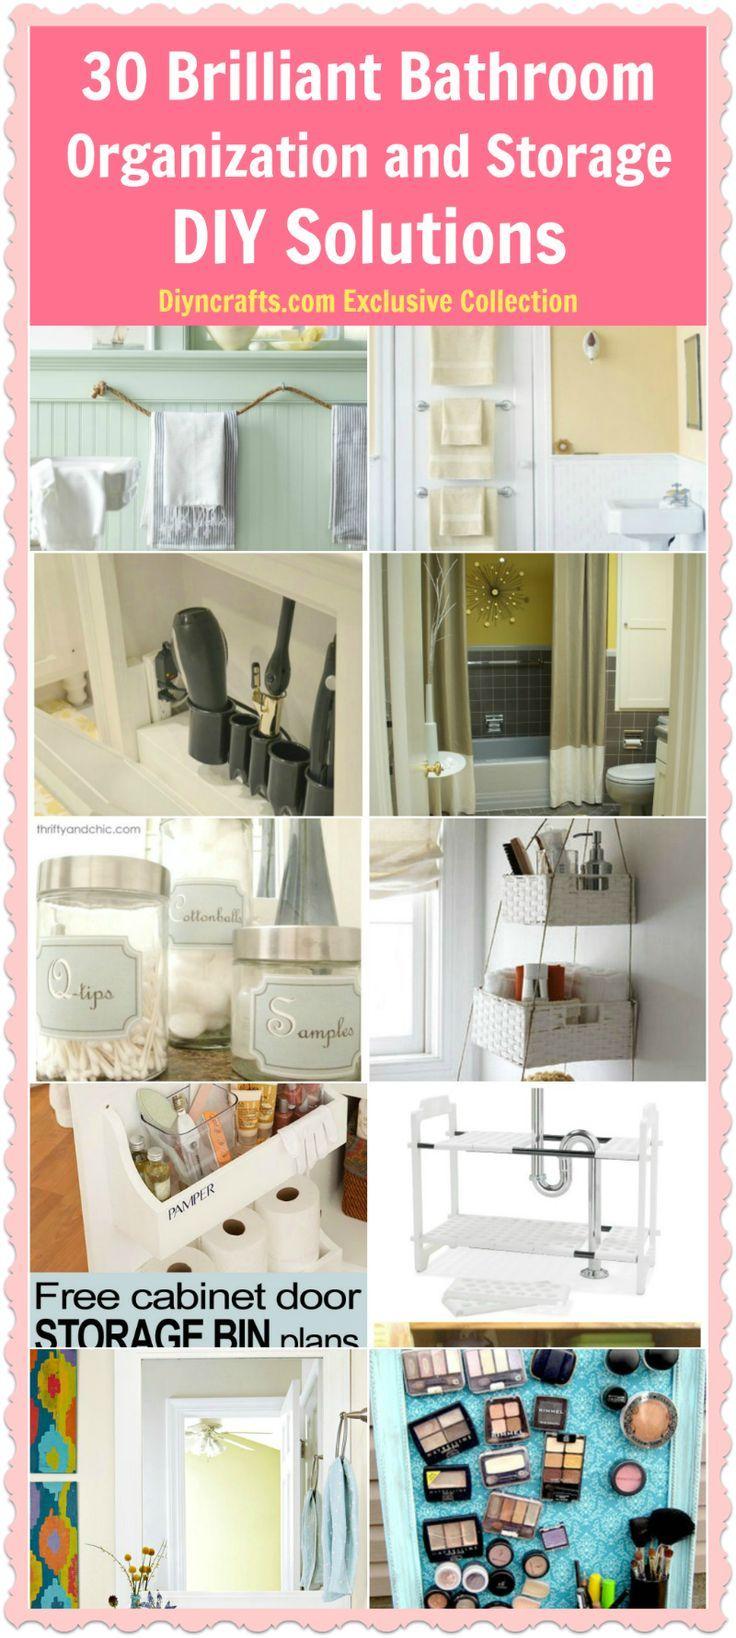 74 best linen u0026 bath organization organized living images on